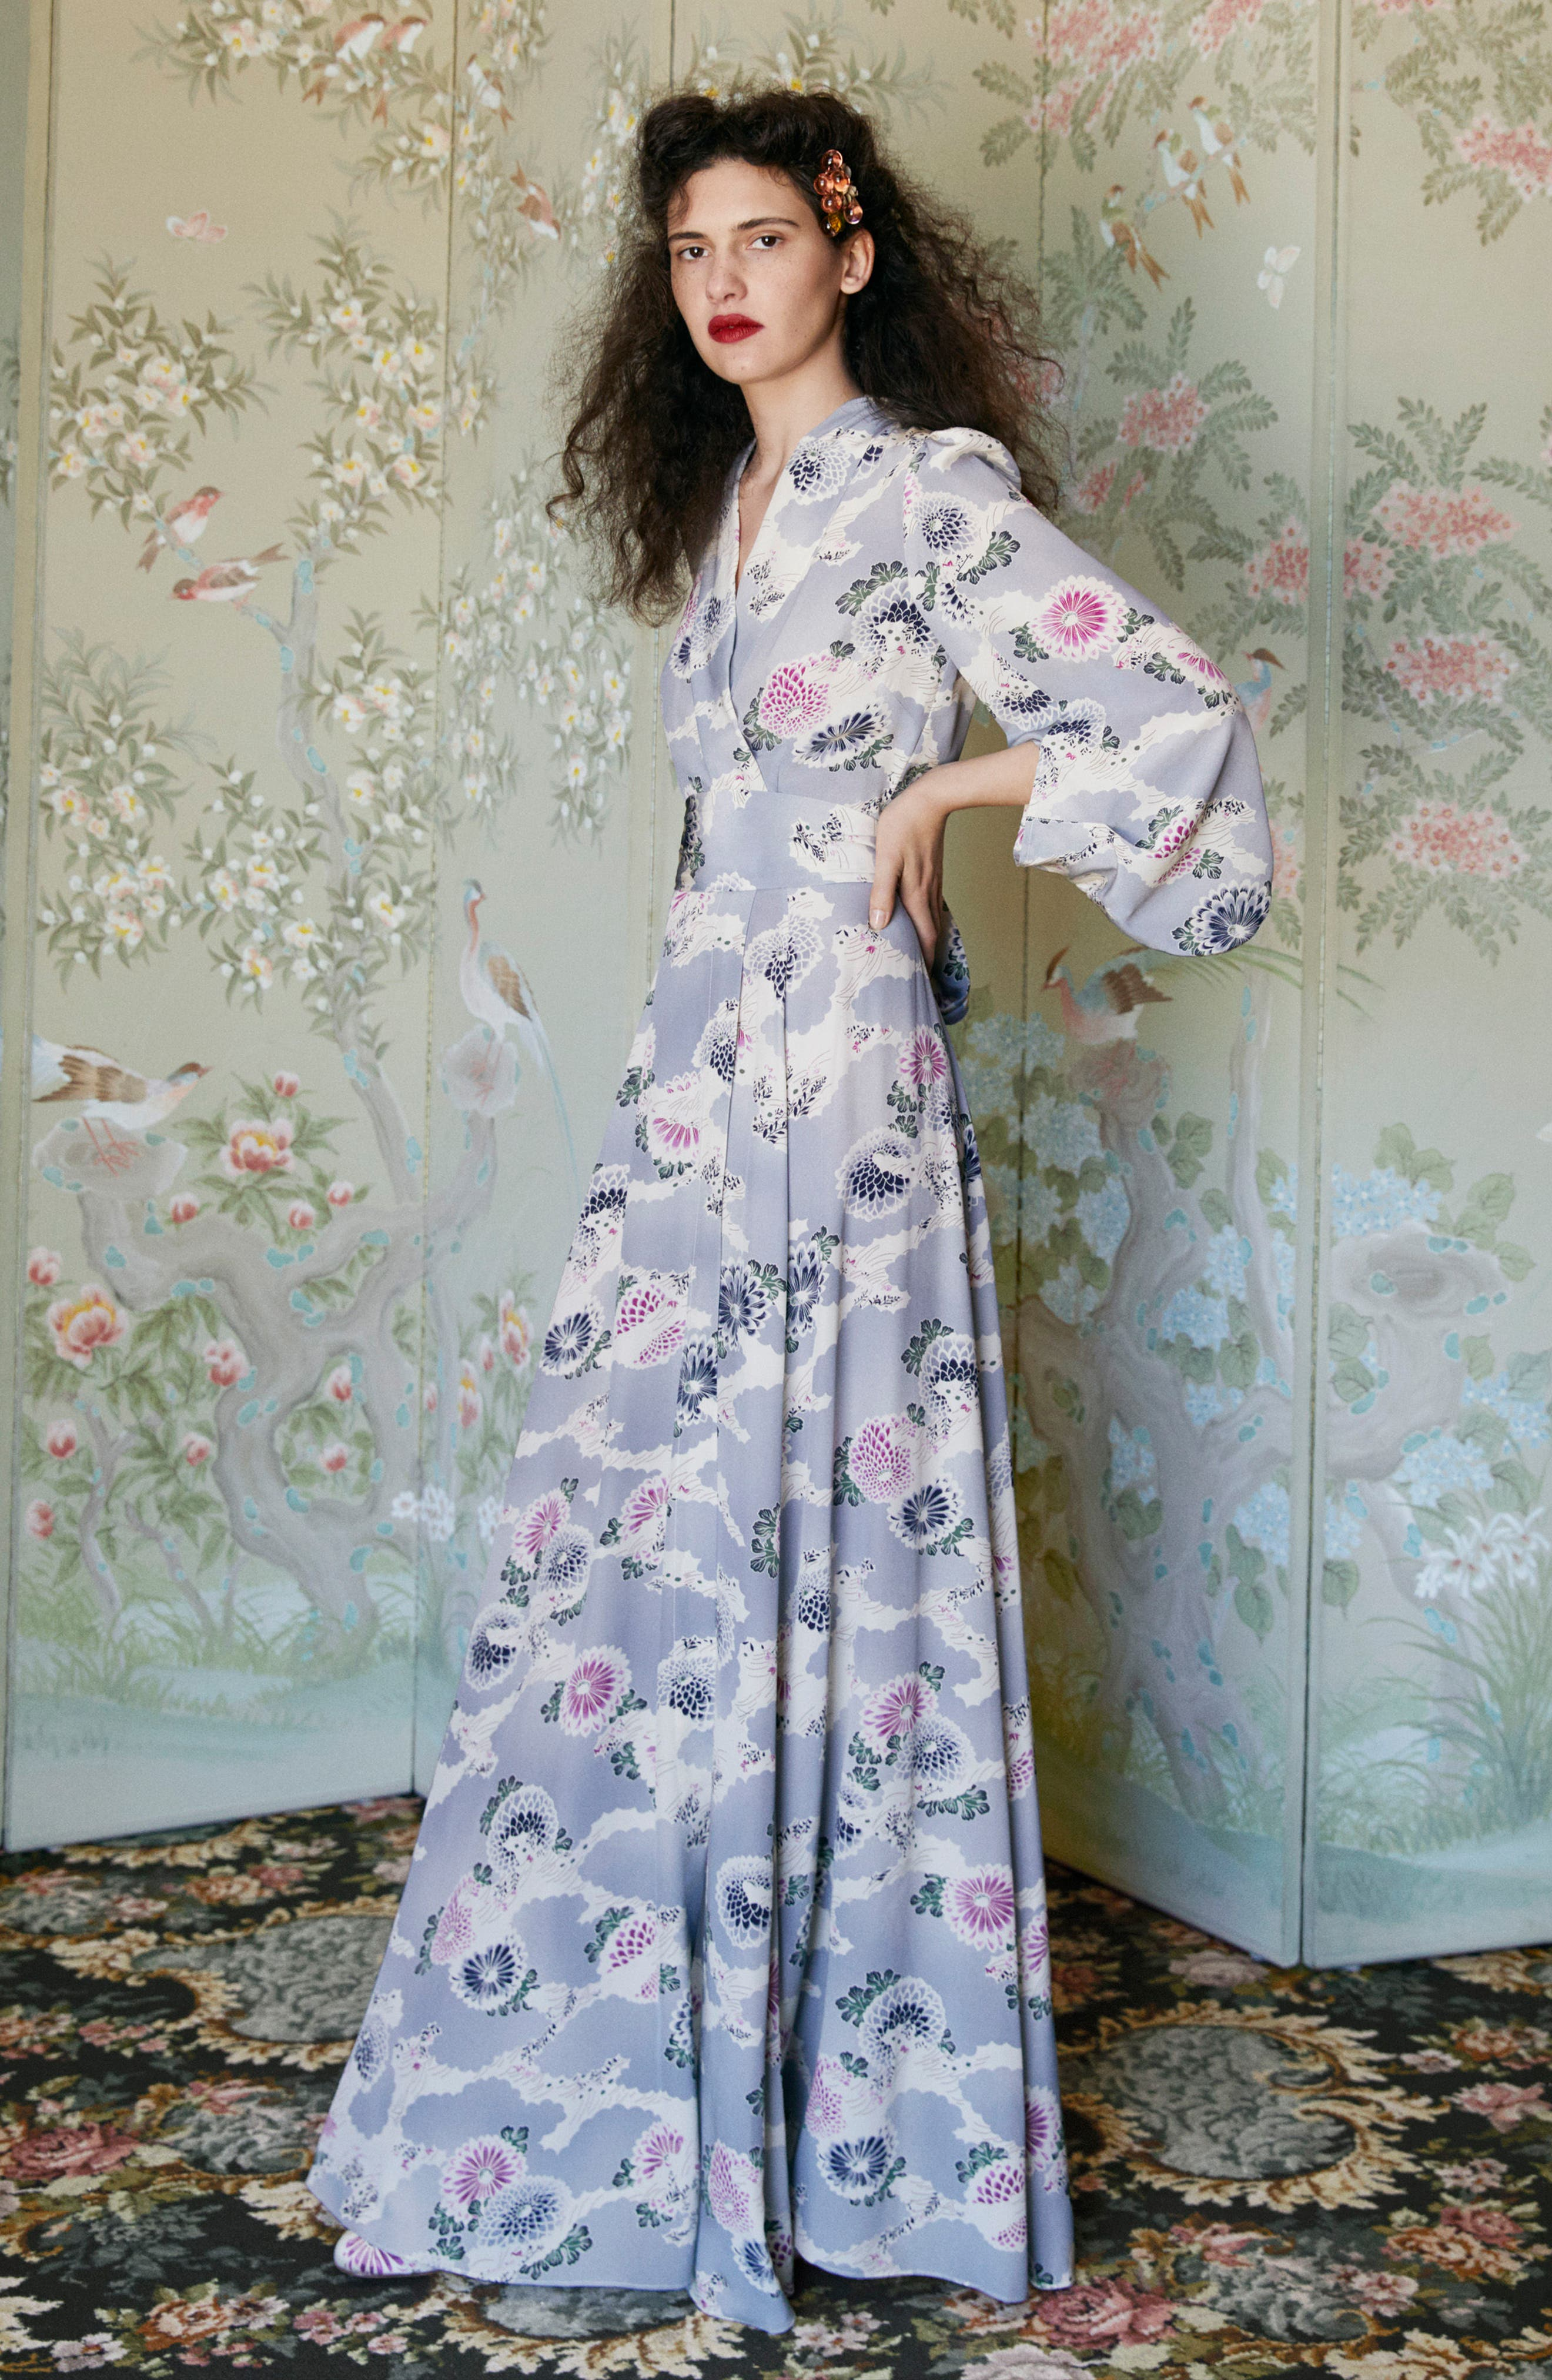 Floral Print Silk Crêpe de Chine Maxi Wrap Dress,                             Alternate thumbnail 2, color,                             Chrysanthemum Print